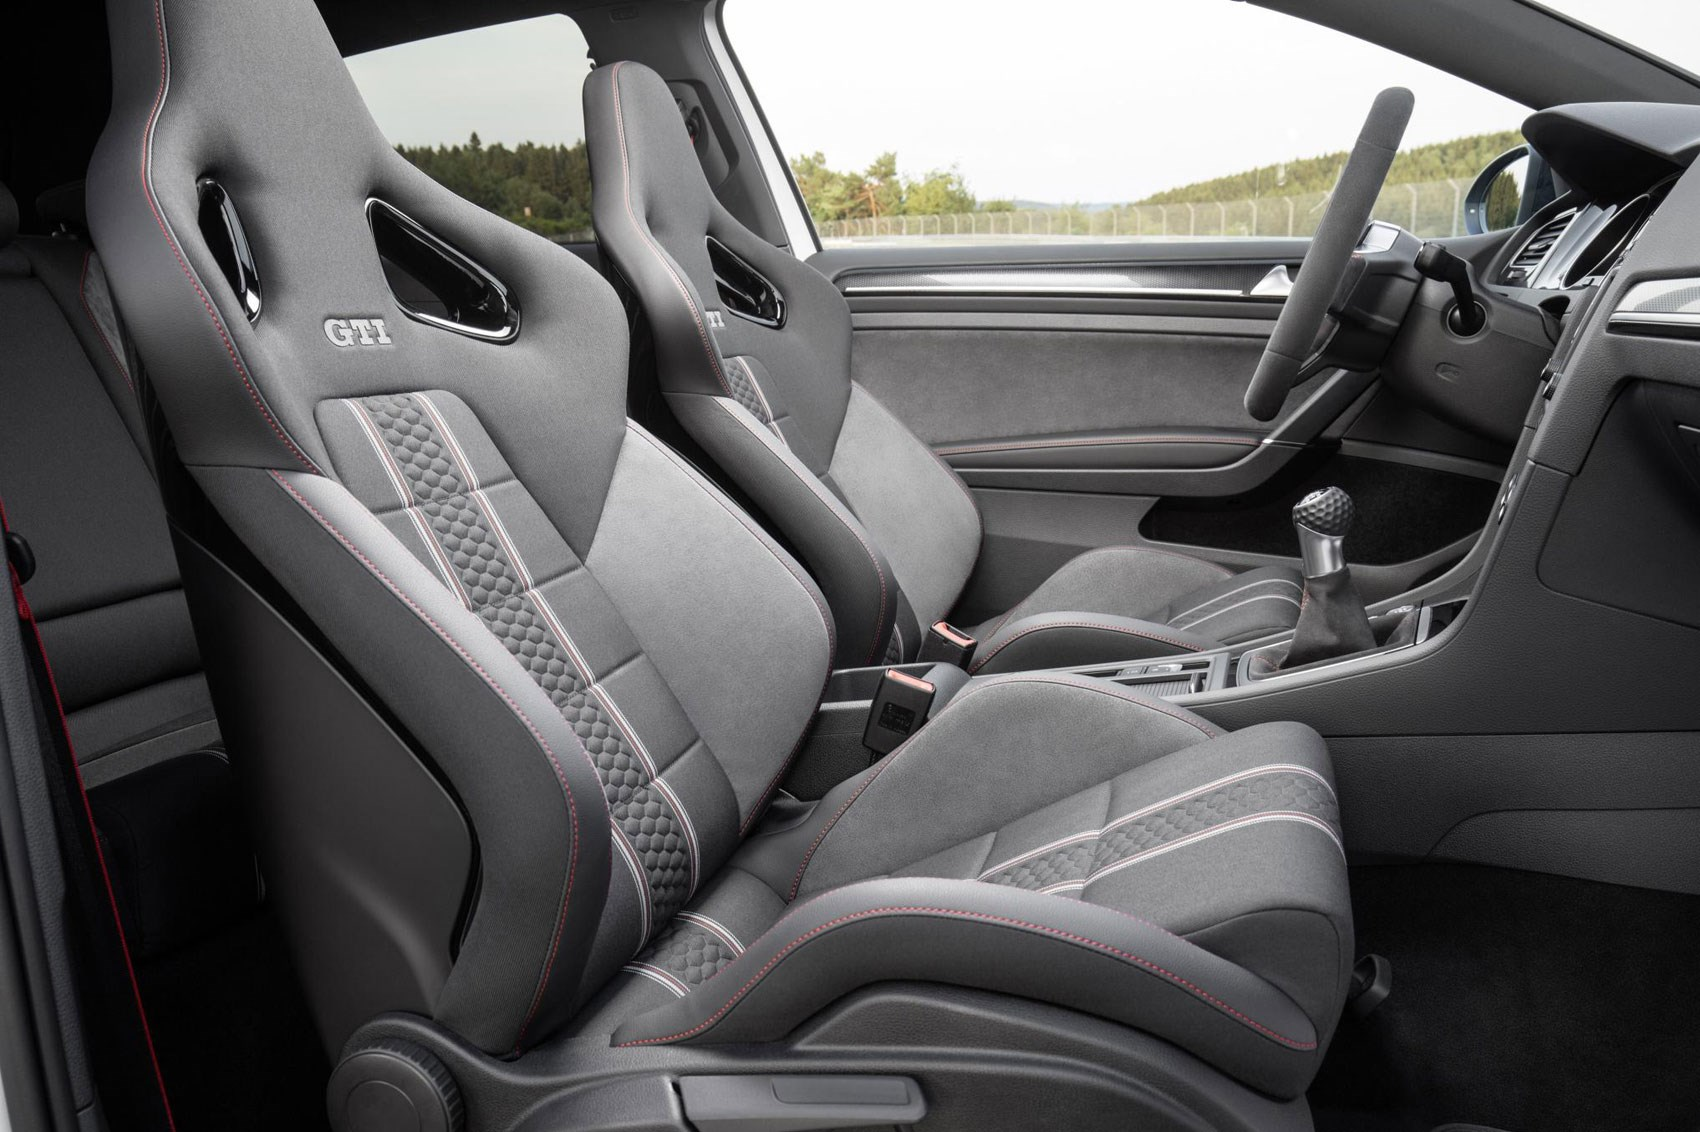 2016 Volkswagen Golf GTI Clubsport Front Seats Interior